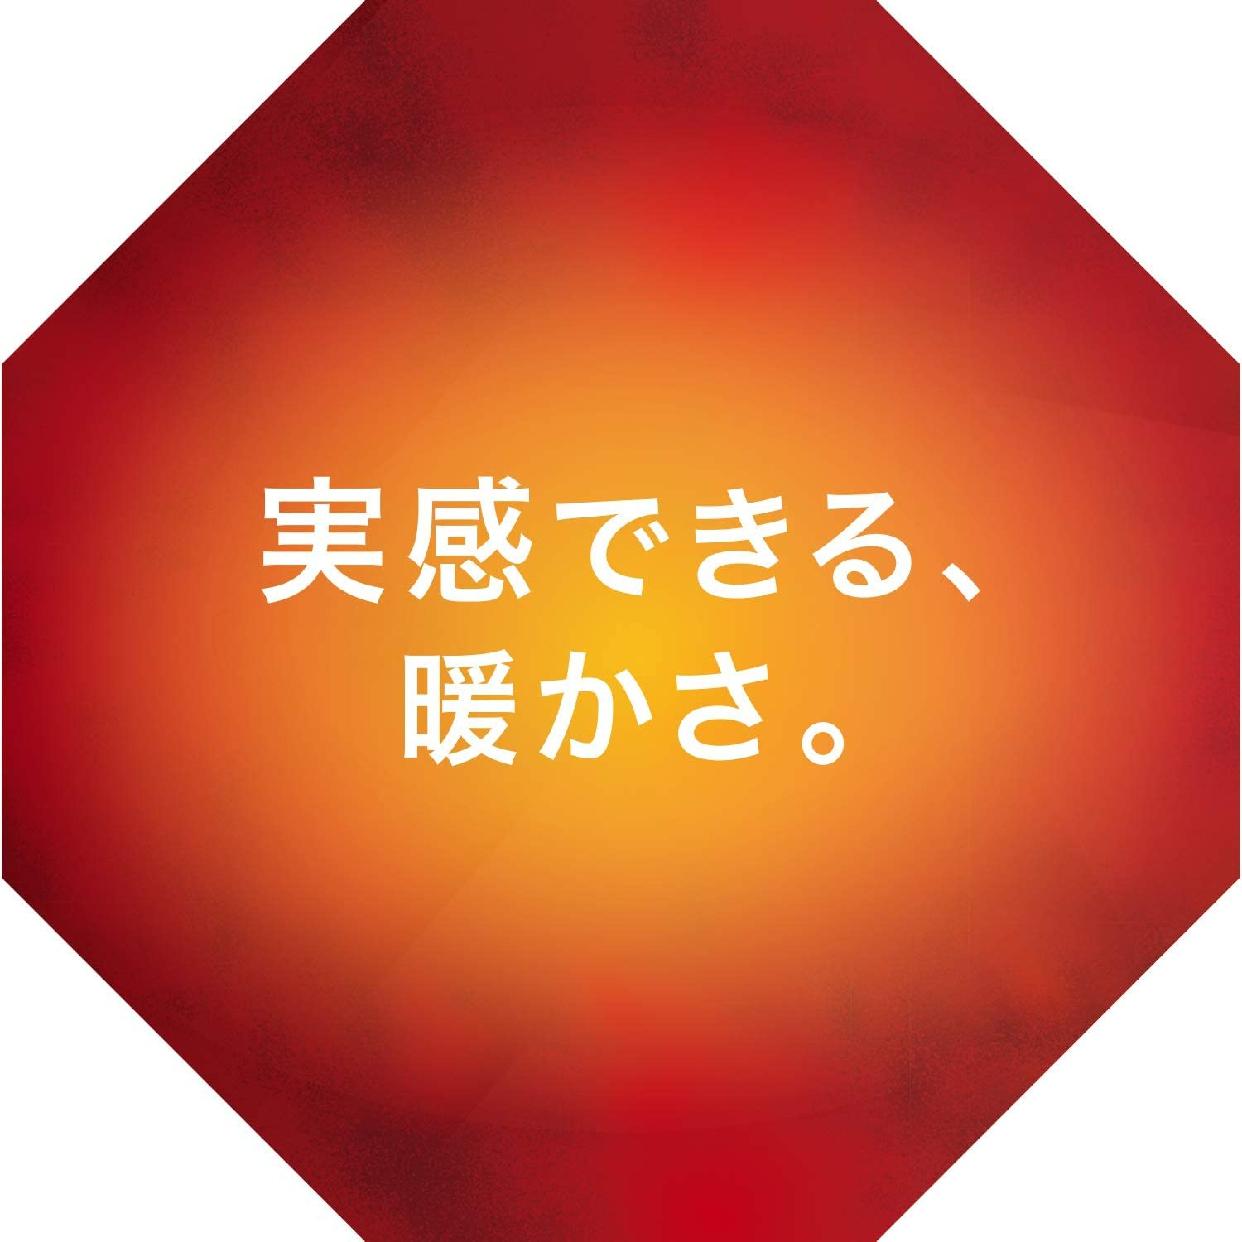 MIZUNO(ミズノ) ルームシューズの商品画像5